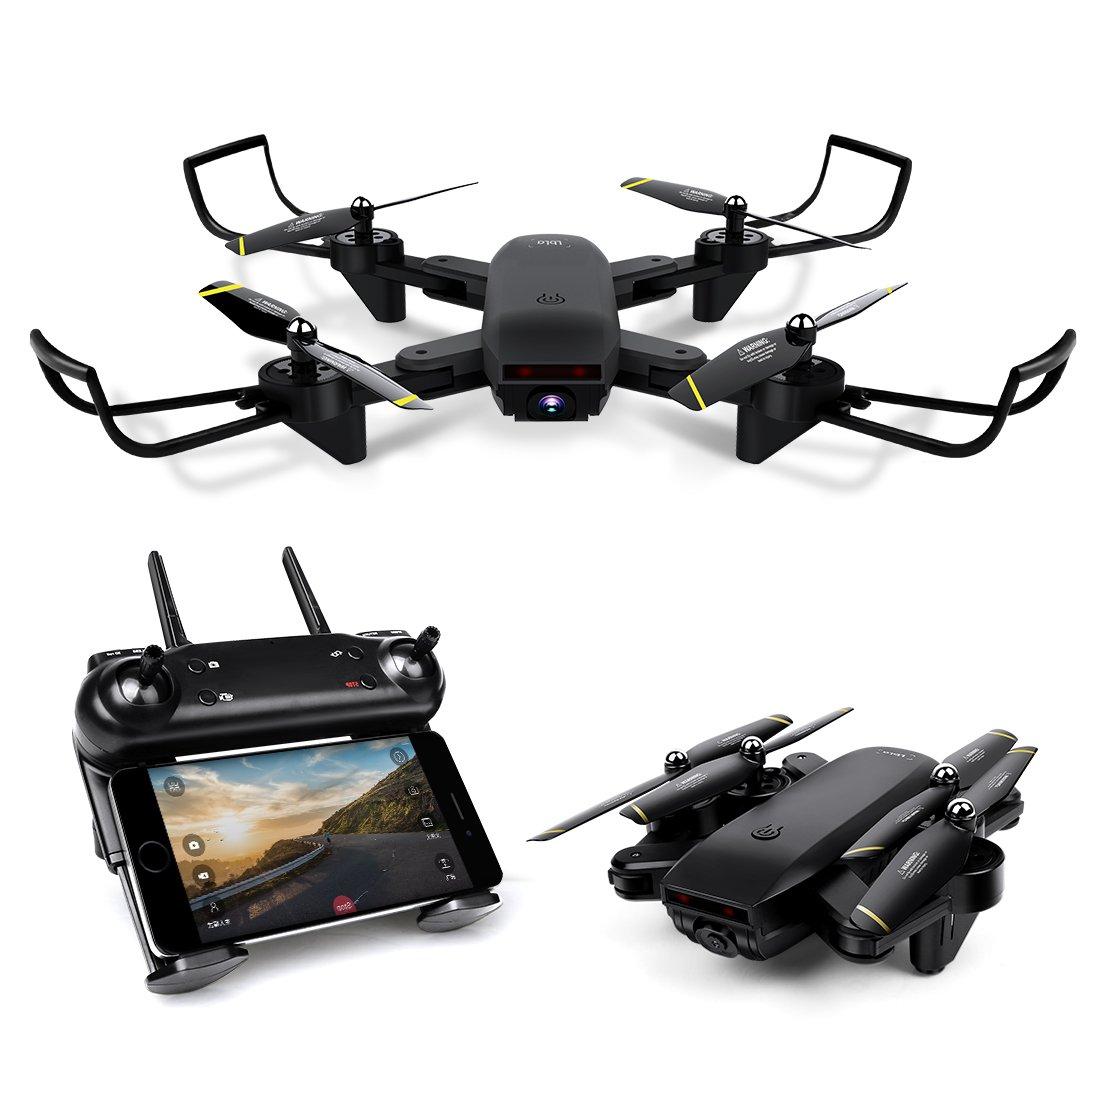 LBLA Drone Camera,WiFi FPV Quadcopter 720P HD Camera Live Video, Headless Mode 2.4GHz 4 CH 6 Axis Gyro Foldable RTF RC Quadcopter Black